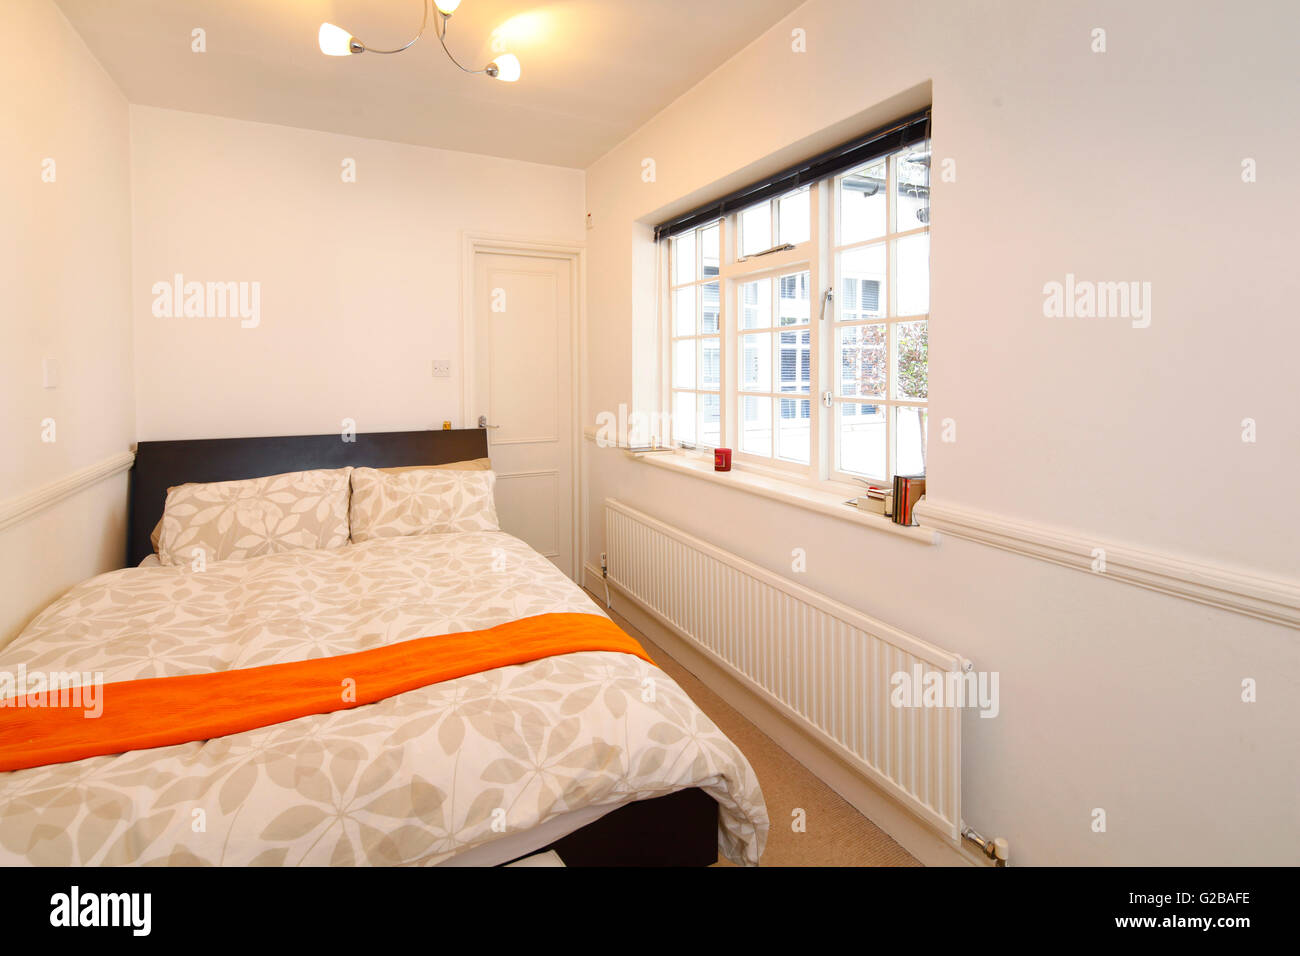 Harrington Gardens. Small Bedroom With Minimal Furniture. Large Window And  Long Radiator On Wall.